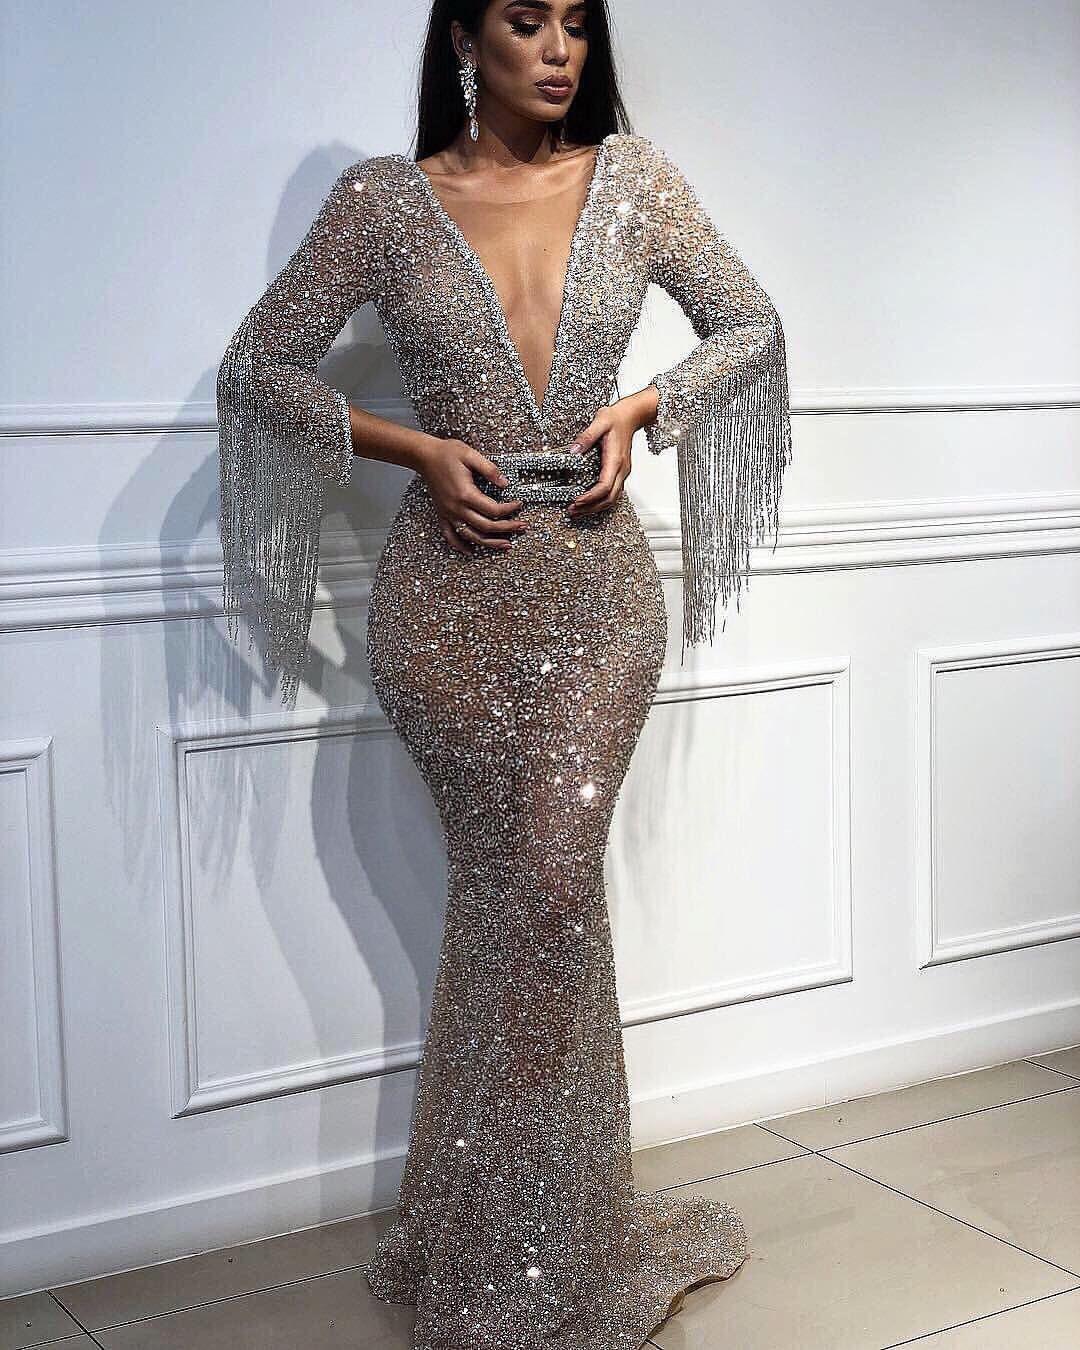 Mermaid Party Dresses Womens Vintage Deep-V Beaded Formal Evening Dress